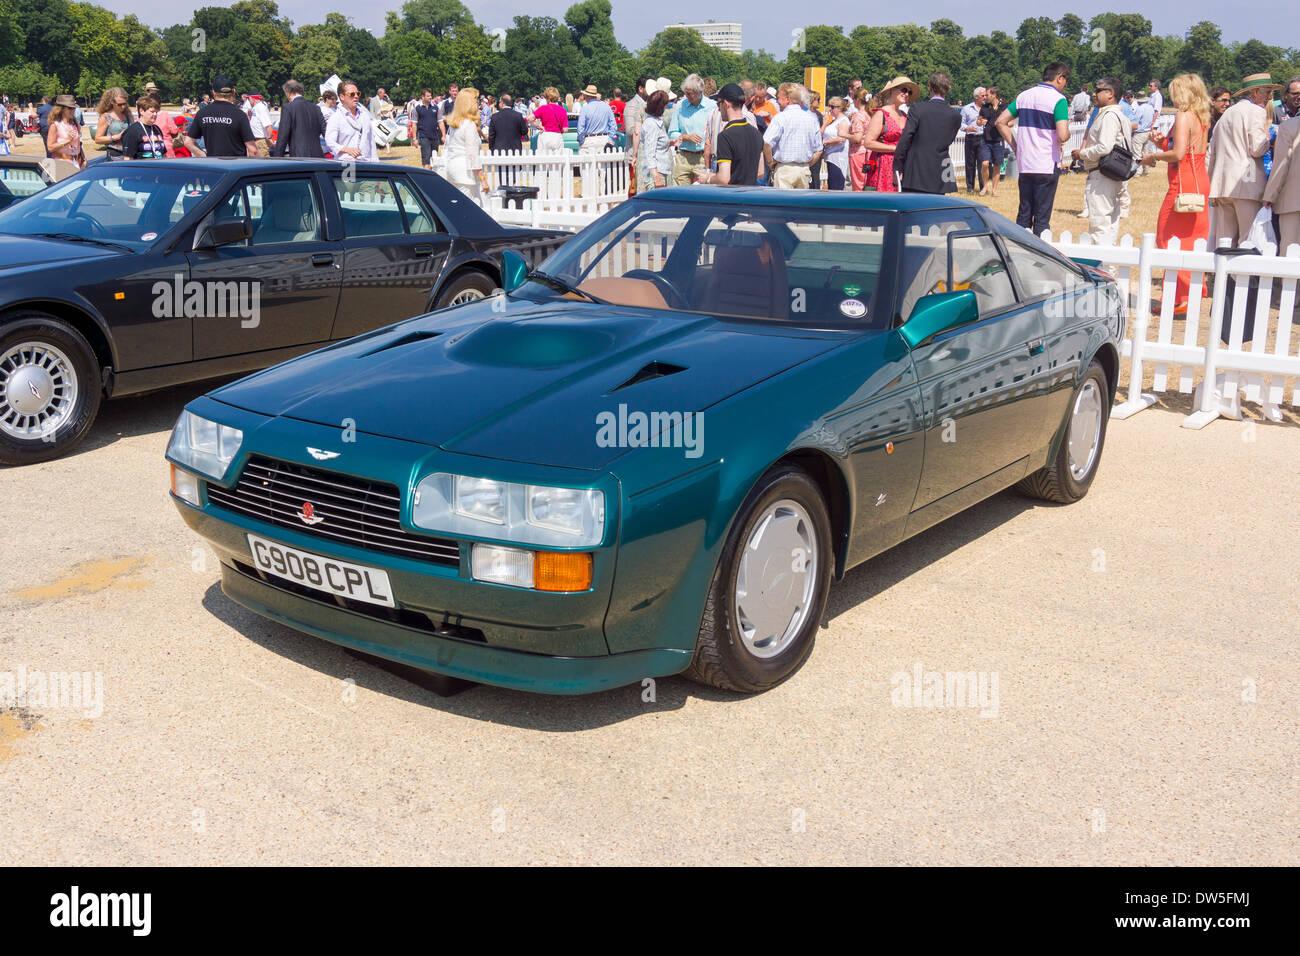 Aston Martin V8 ZAGATO (1987-1990), Aston Martin Timeline, Centenary Celebration 2013, 100 years Aston Martin, Kensington Stock Photo